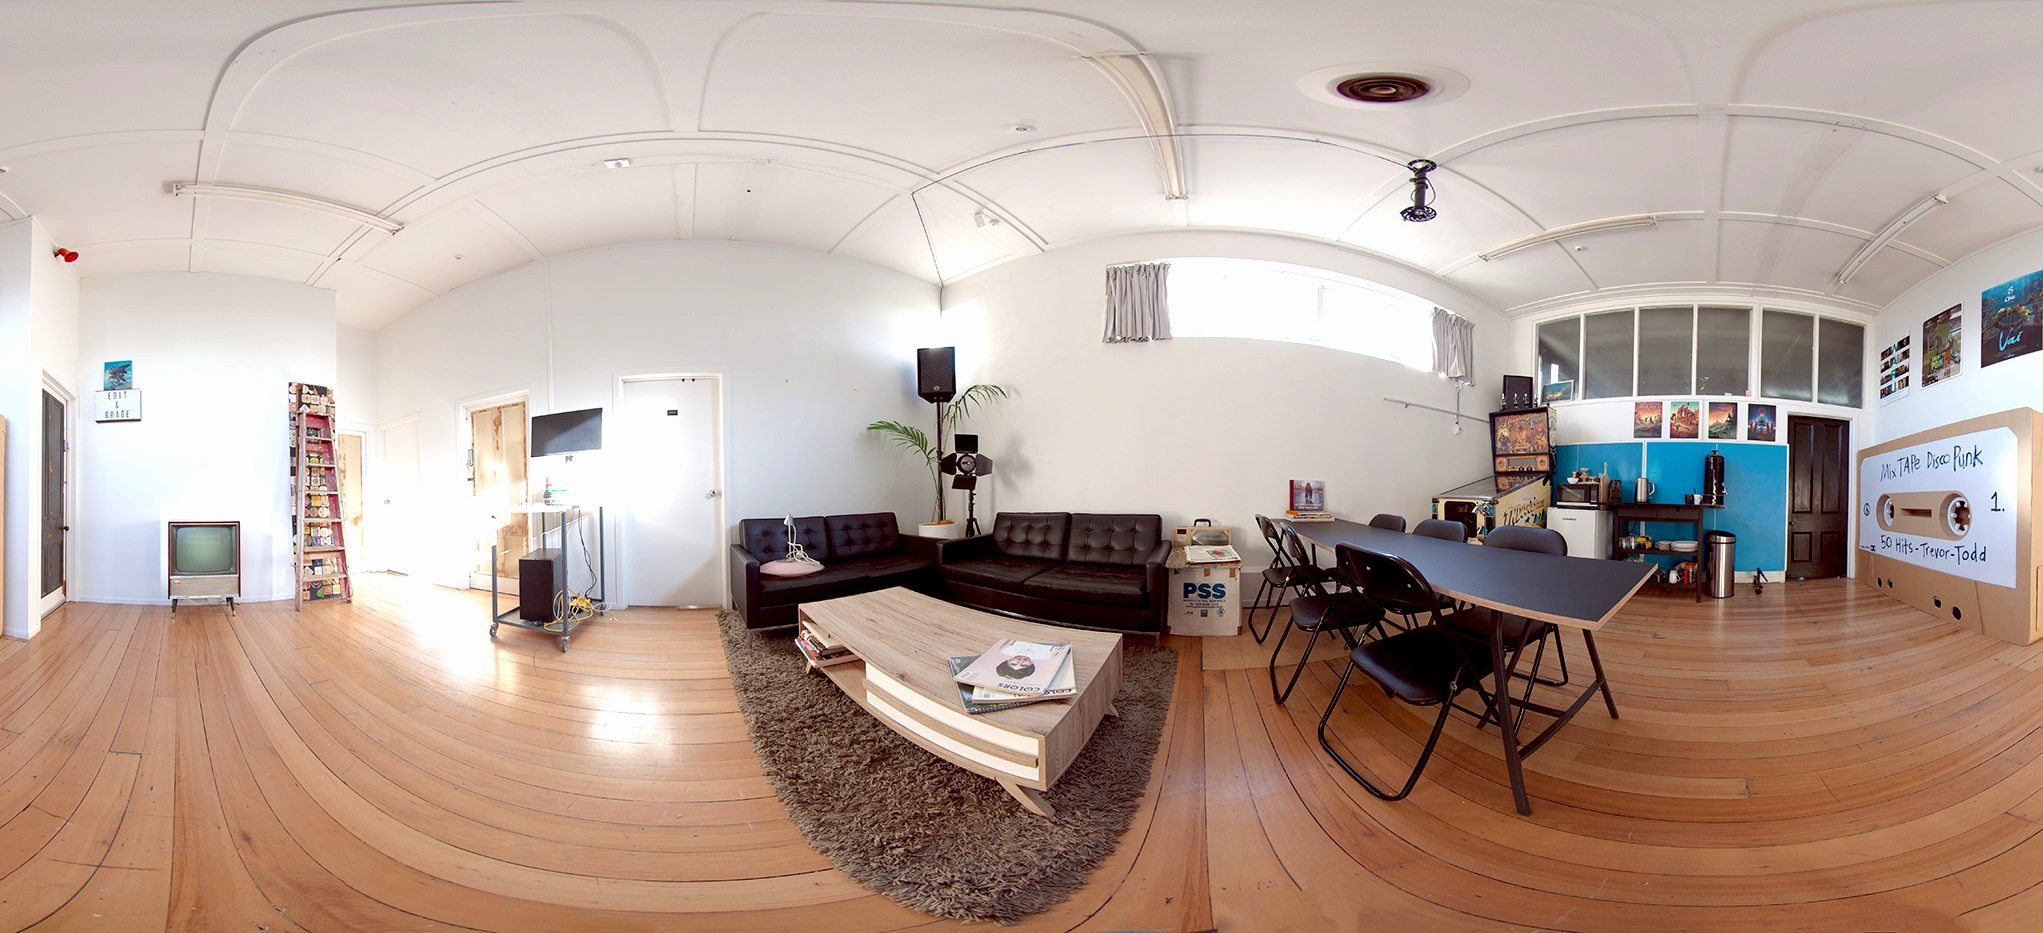 _MG_1855 Panorama_2048.jpg